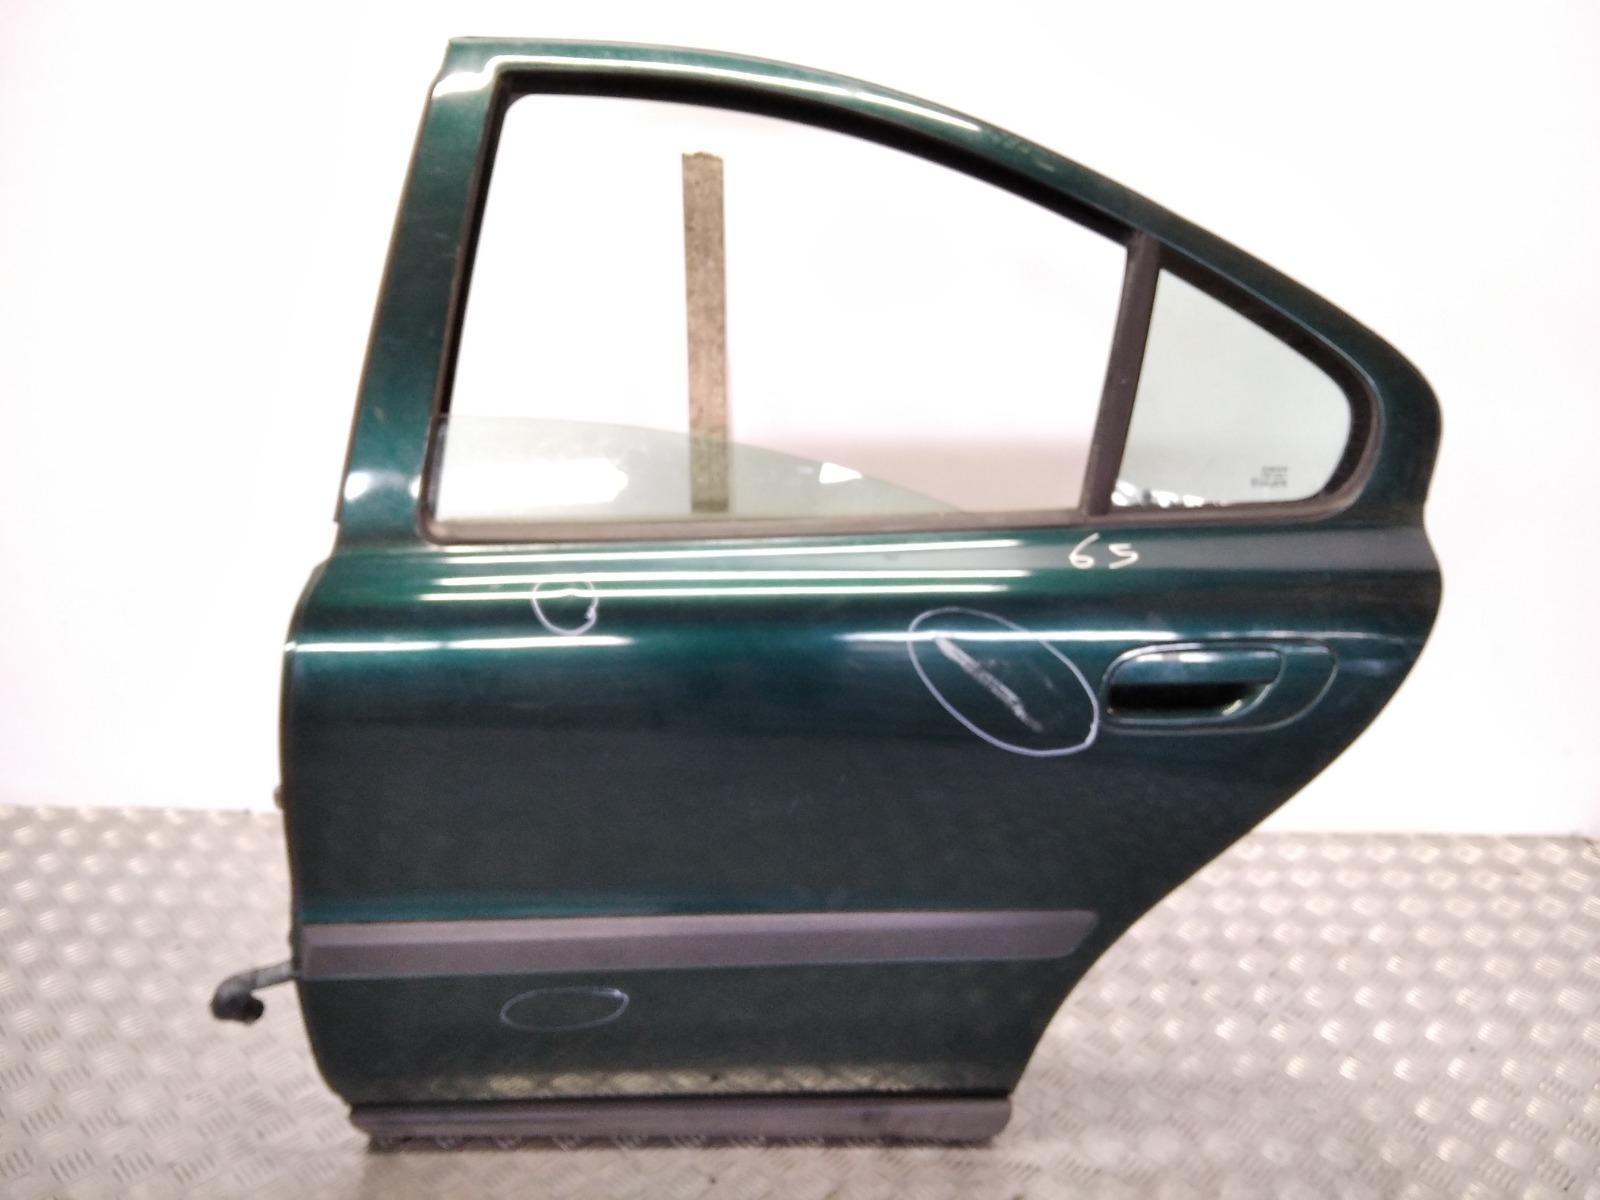 Дверь задняя левая Volvo S60 2.3 TI 2003 (б/у)